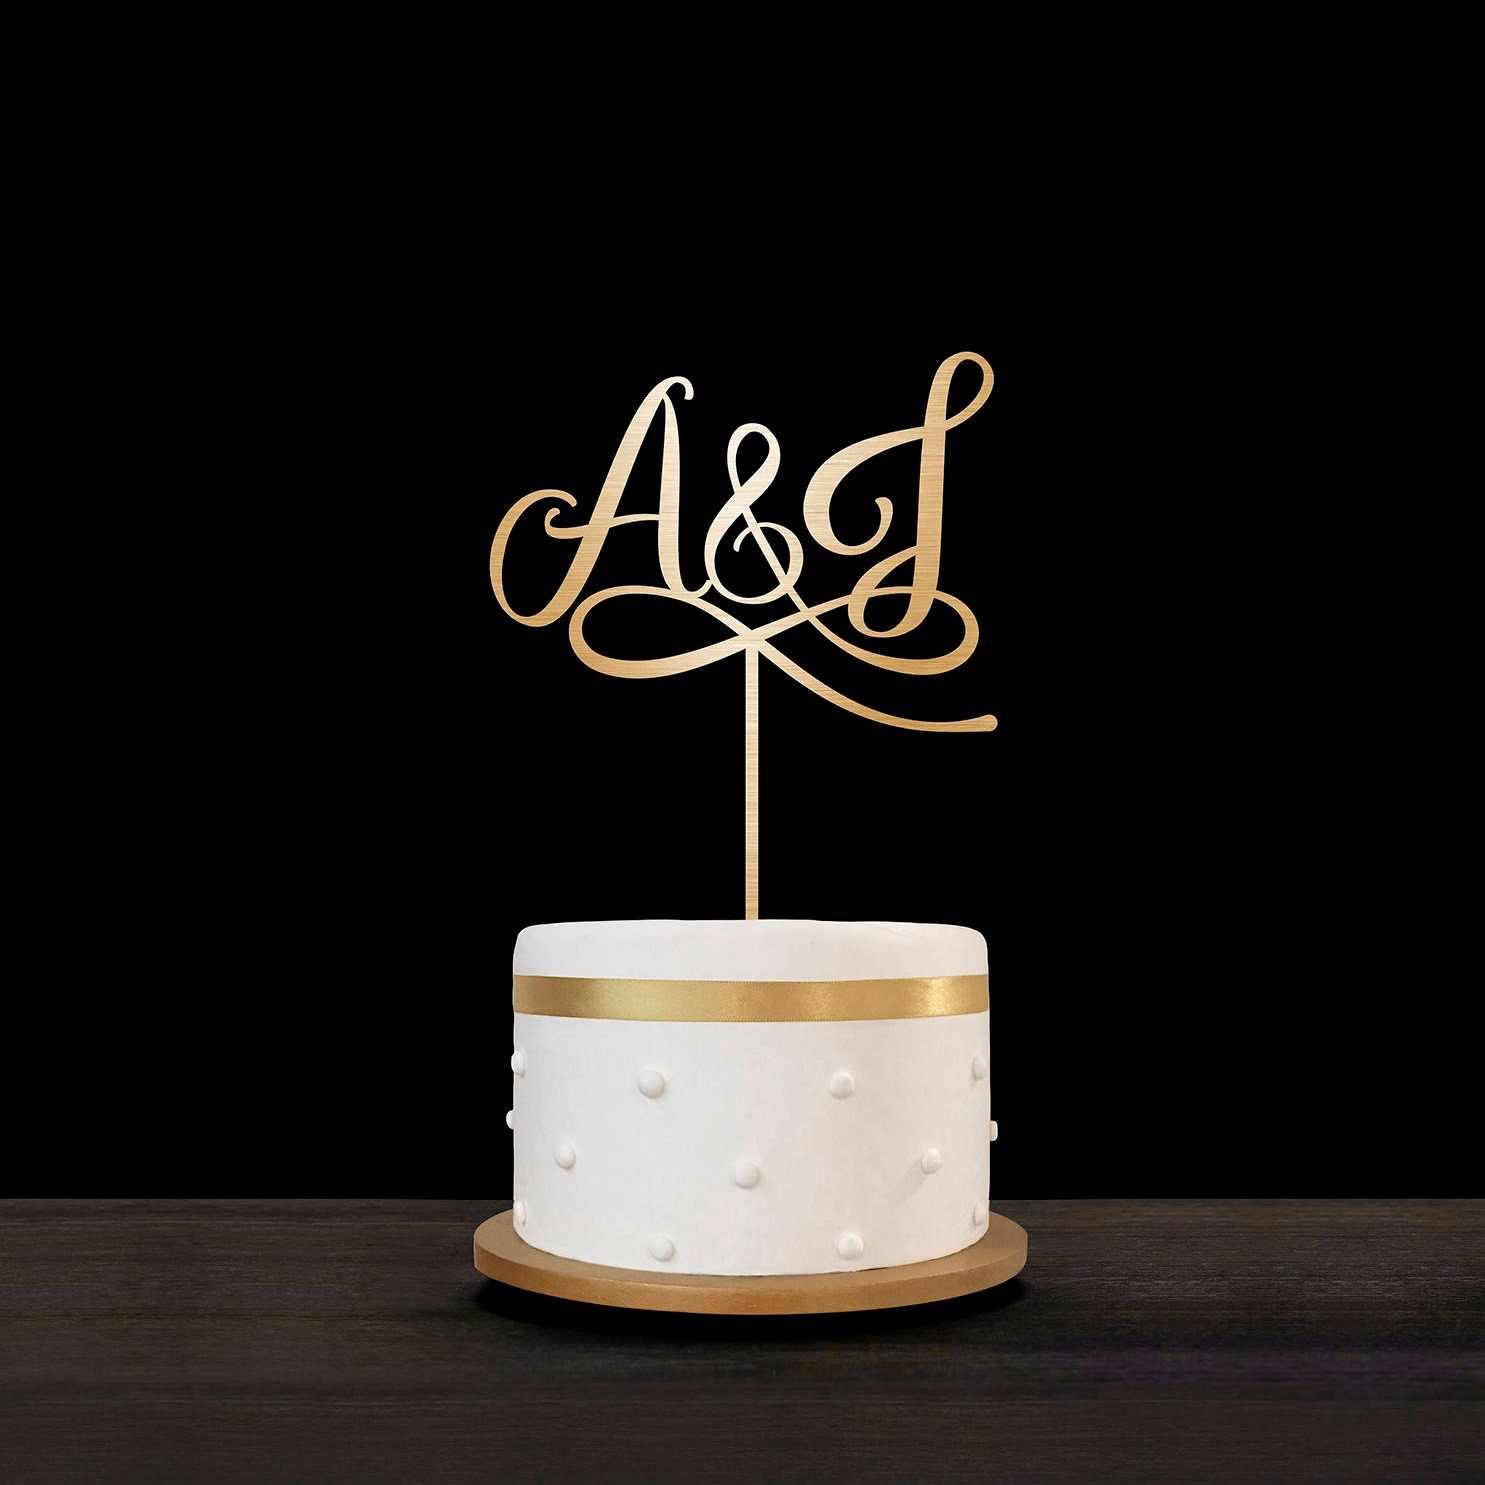 Laser Cut Initials Cake Topper Free Vector